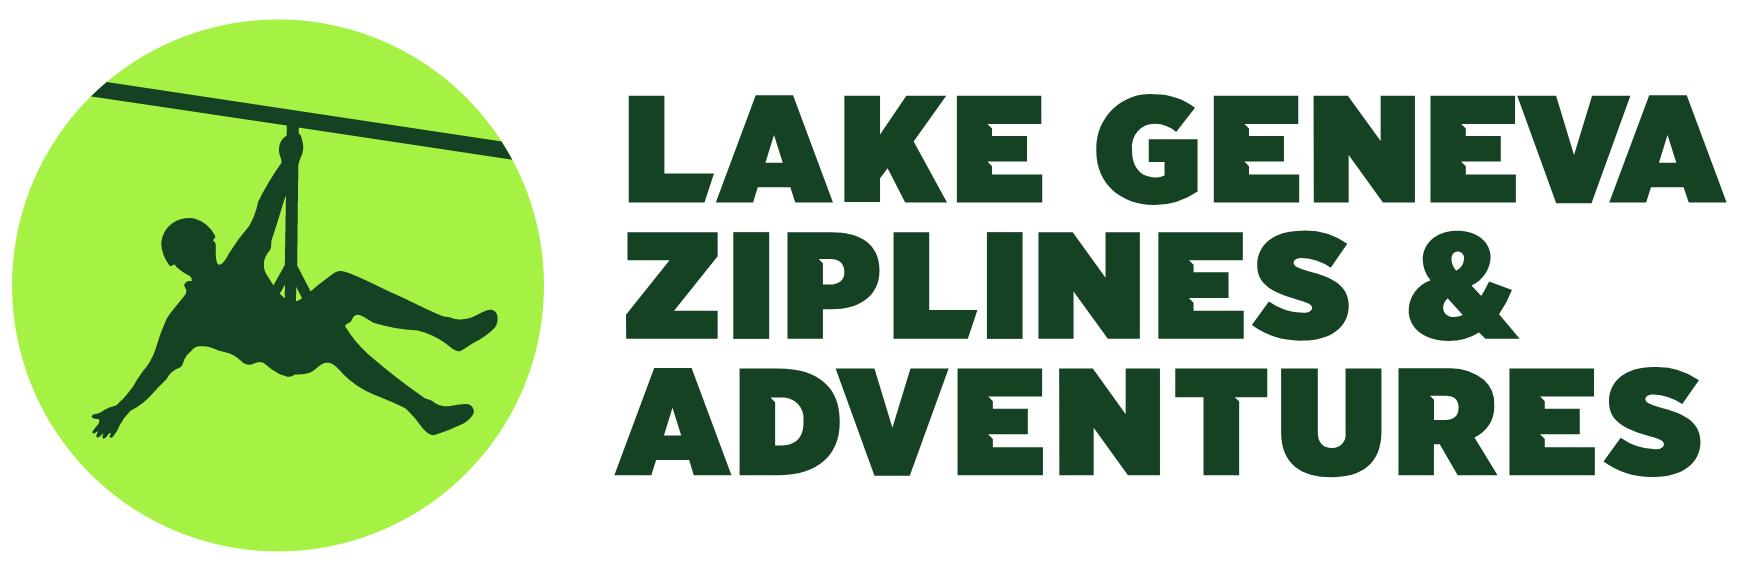 Lake Geneva ZipLines & Adventures